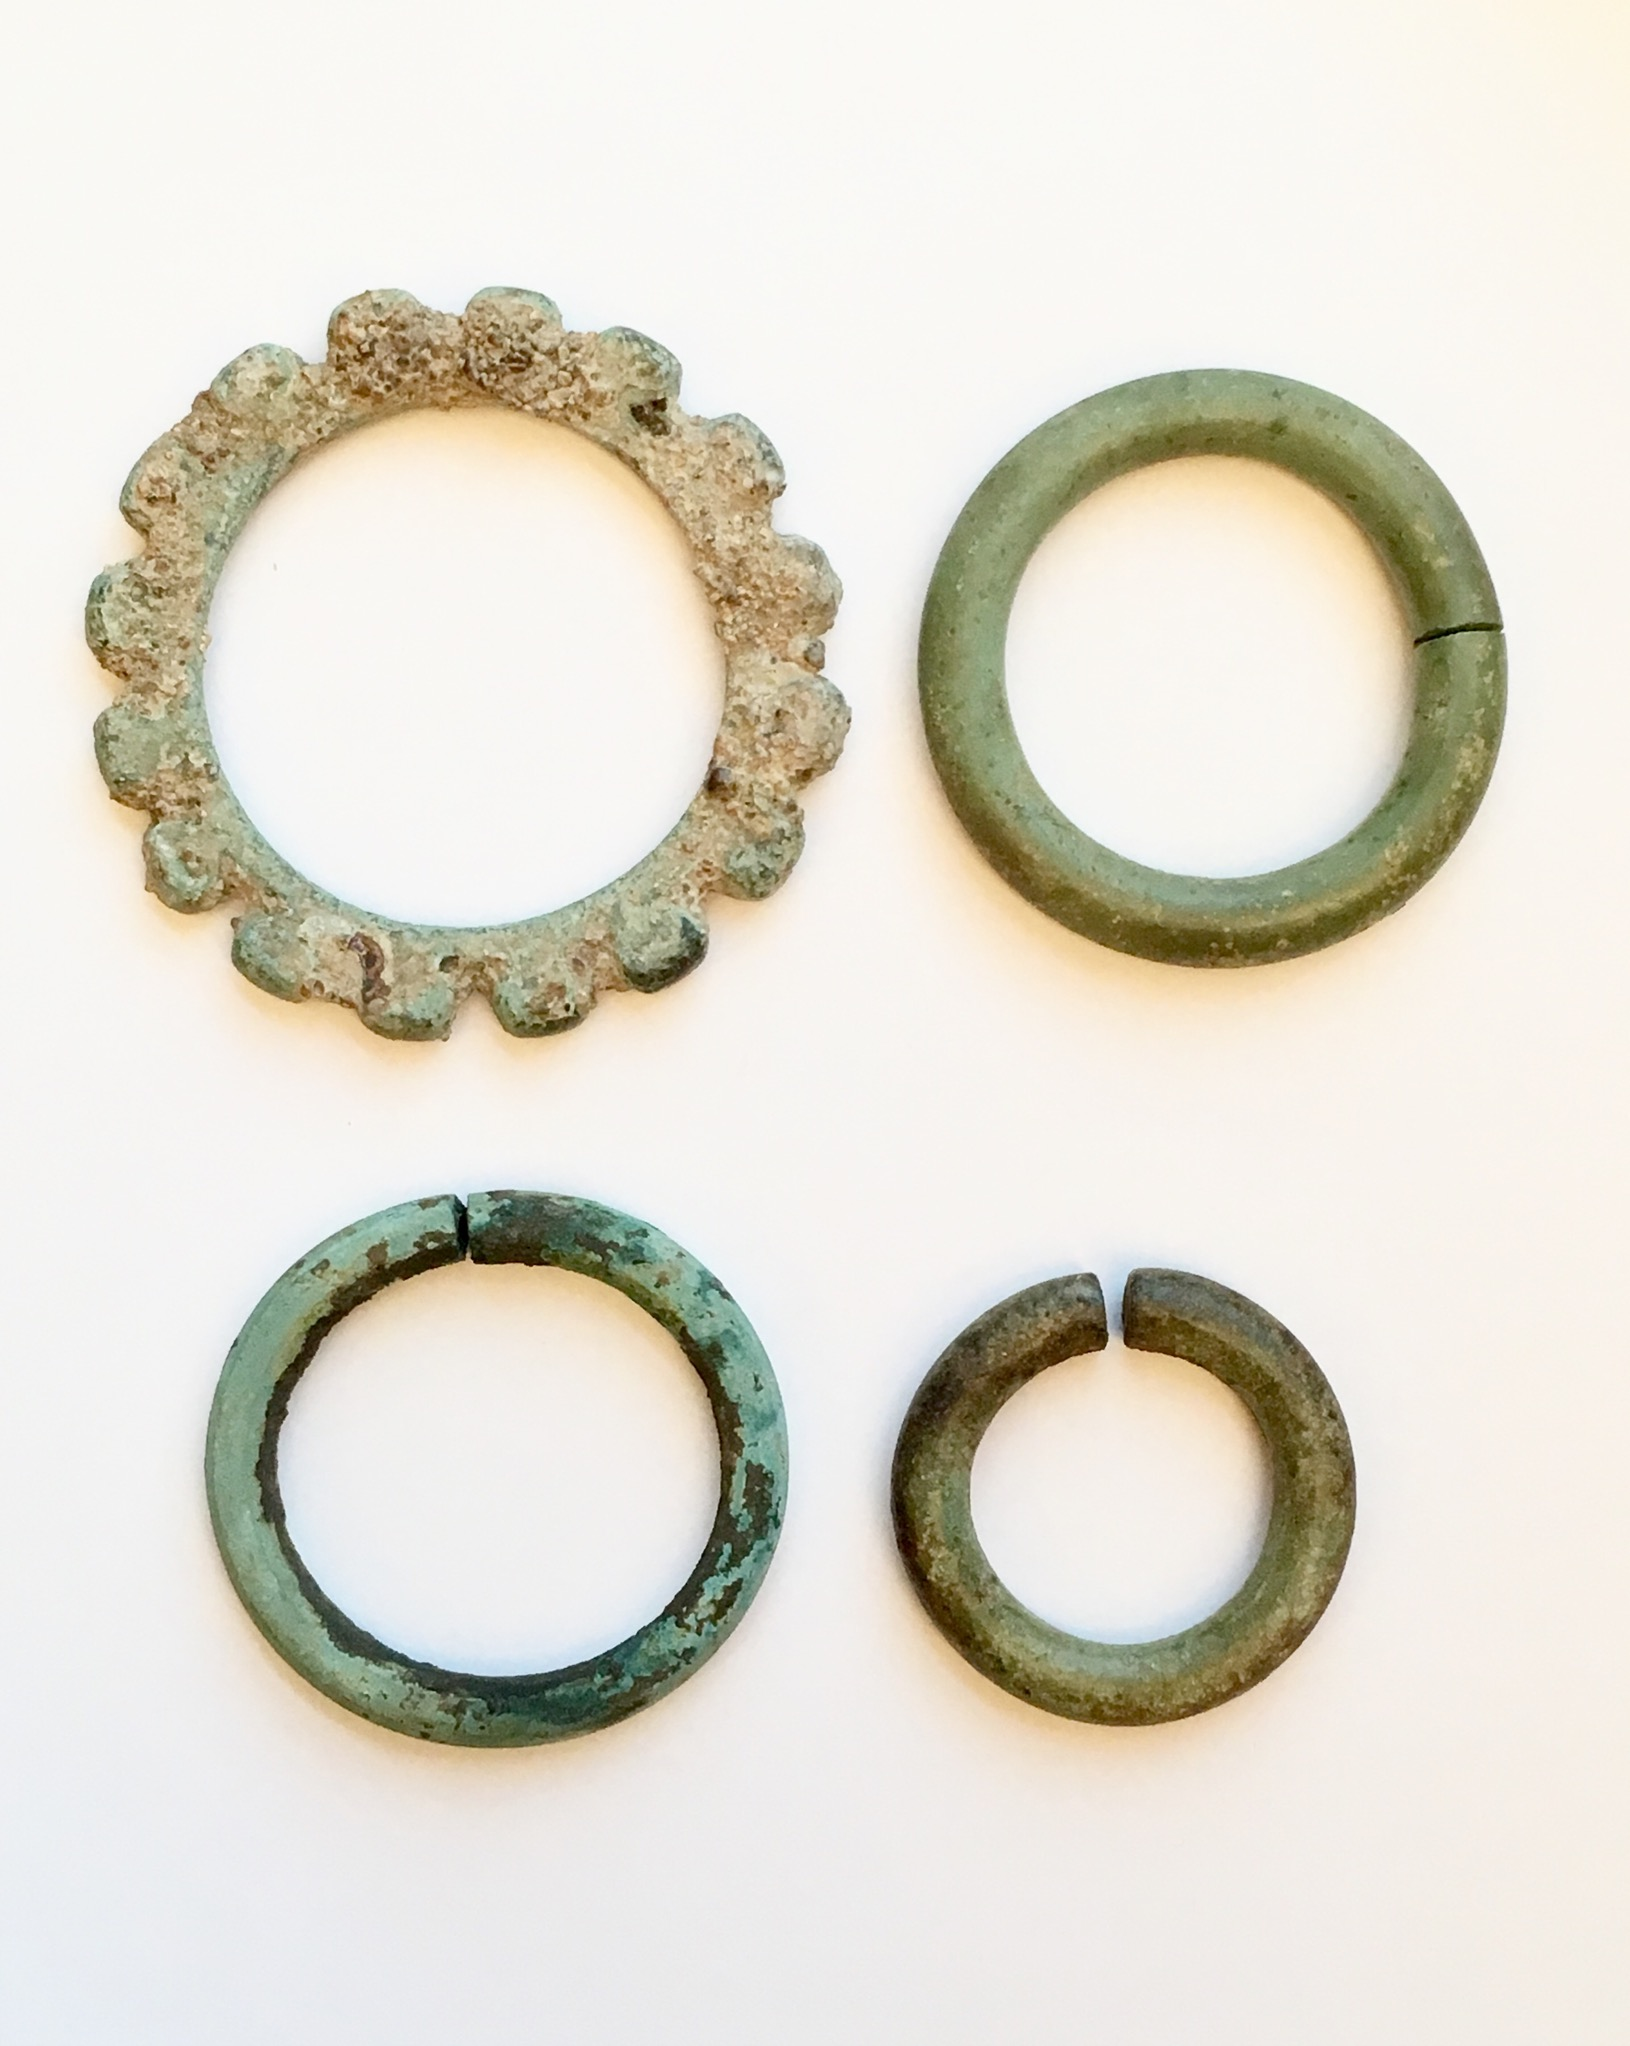 Set of four copper alloy bangles, Javanese